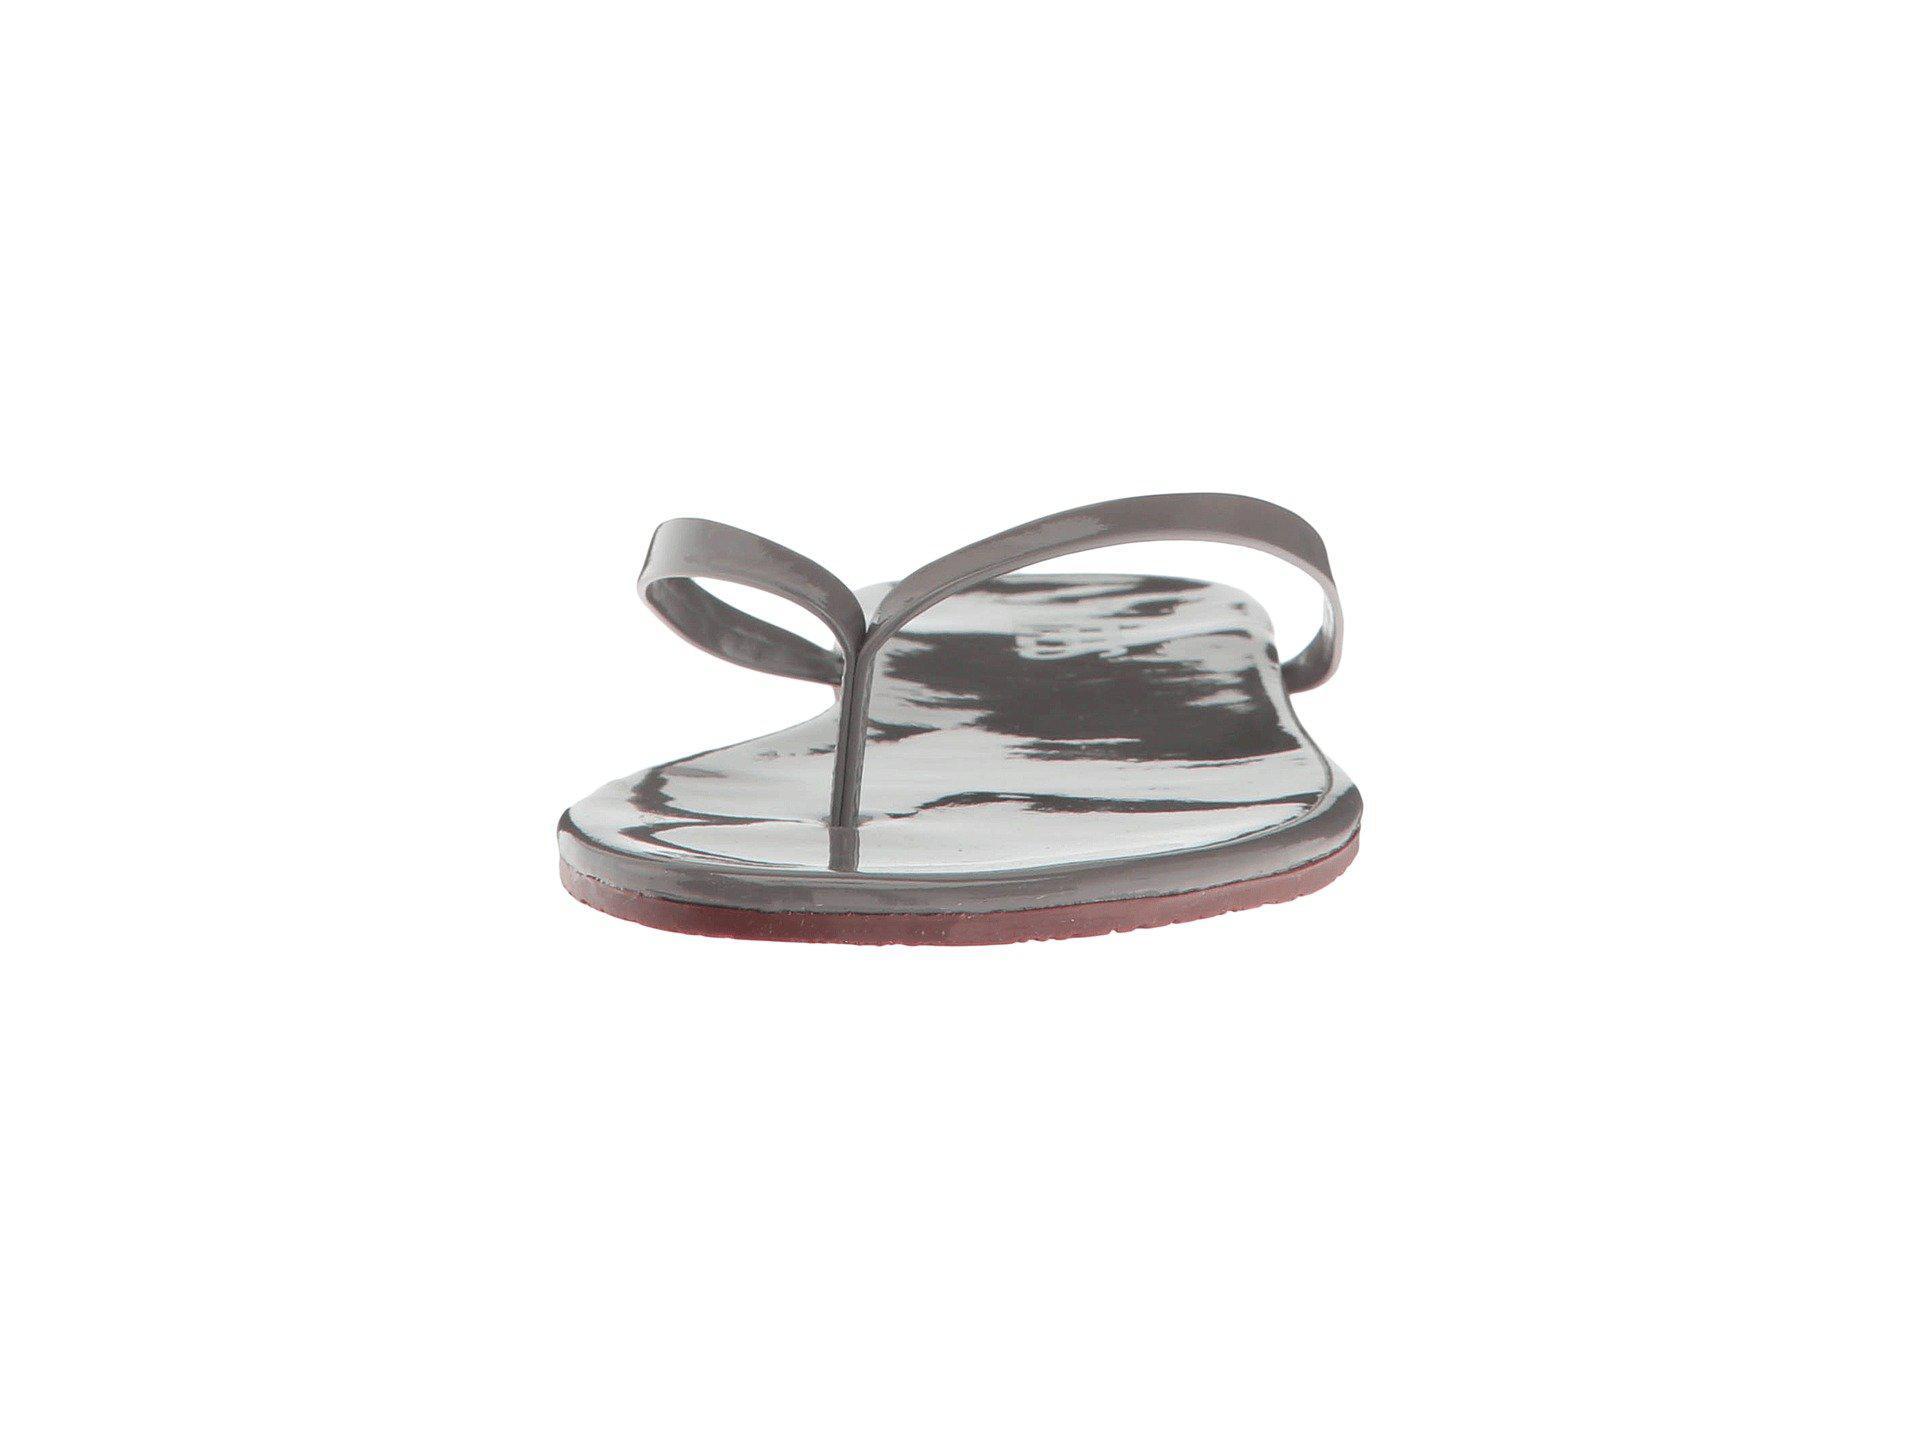 ac05f3cd5 TKEES - Multicolor Glosses (sweet Smoke) Women s Sandals - Lyst. View  fullscreen